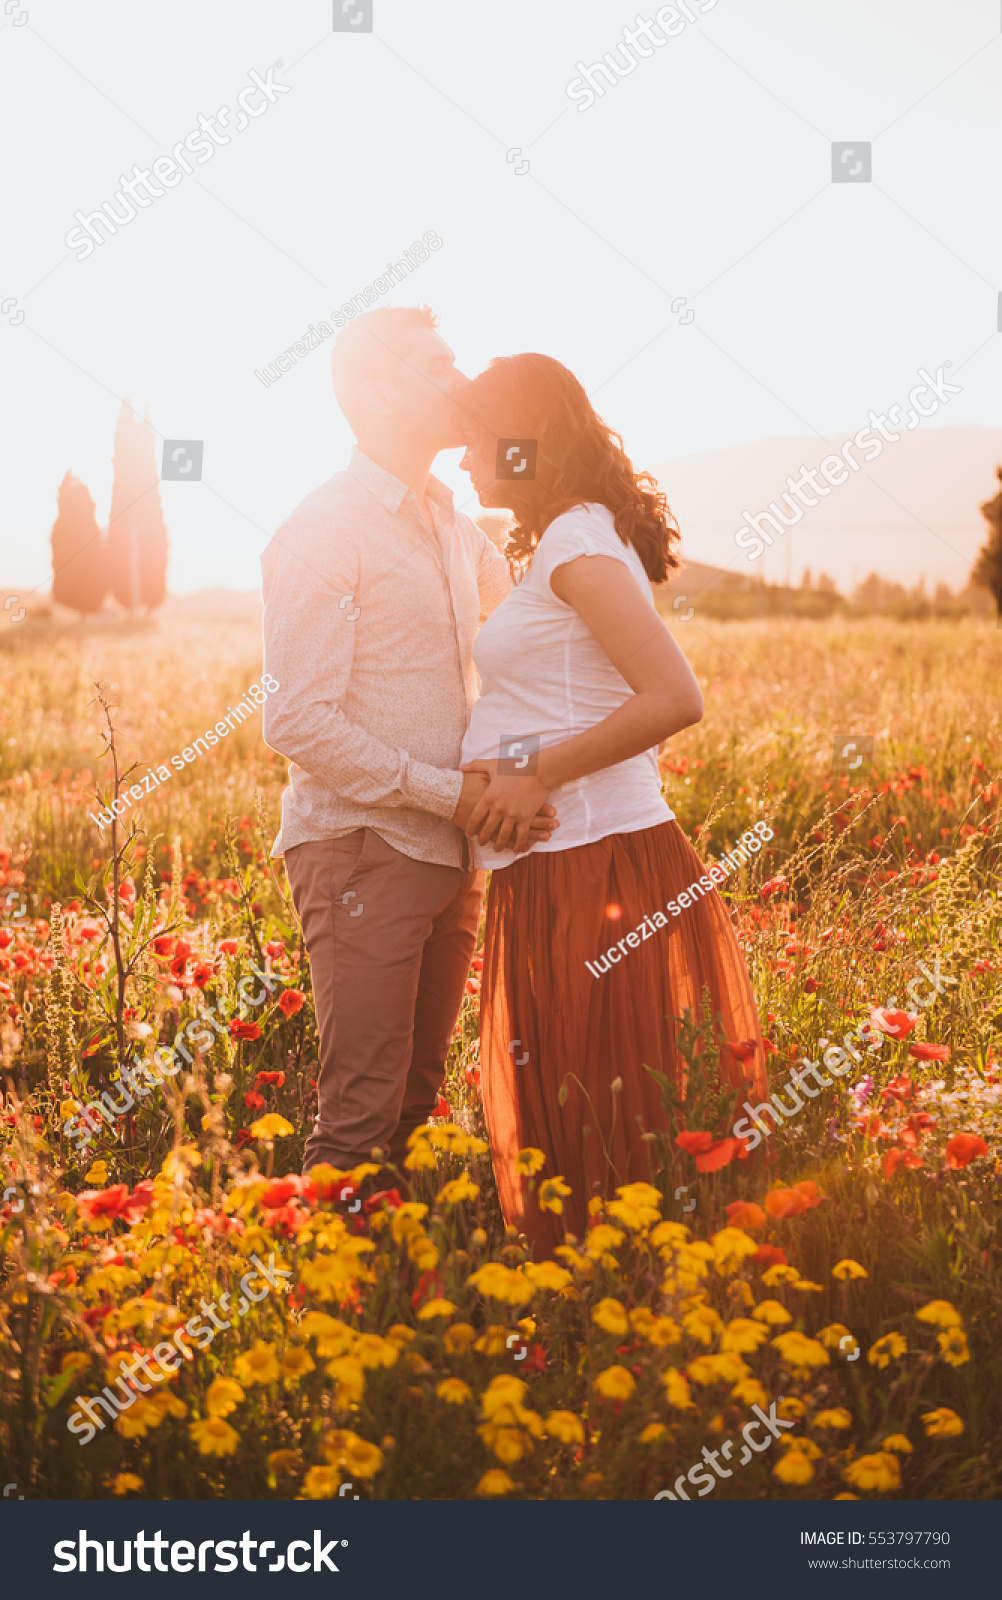 Theme Romantic Couple Pregnancy Outdoors